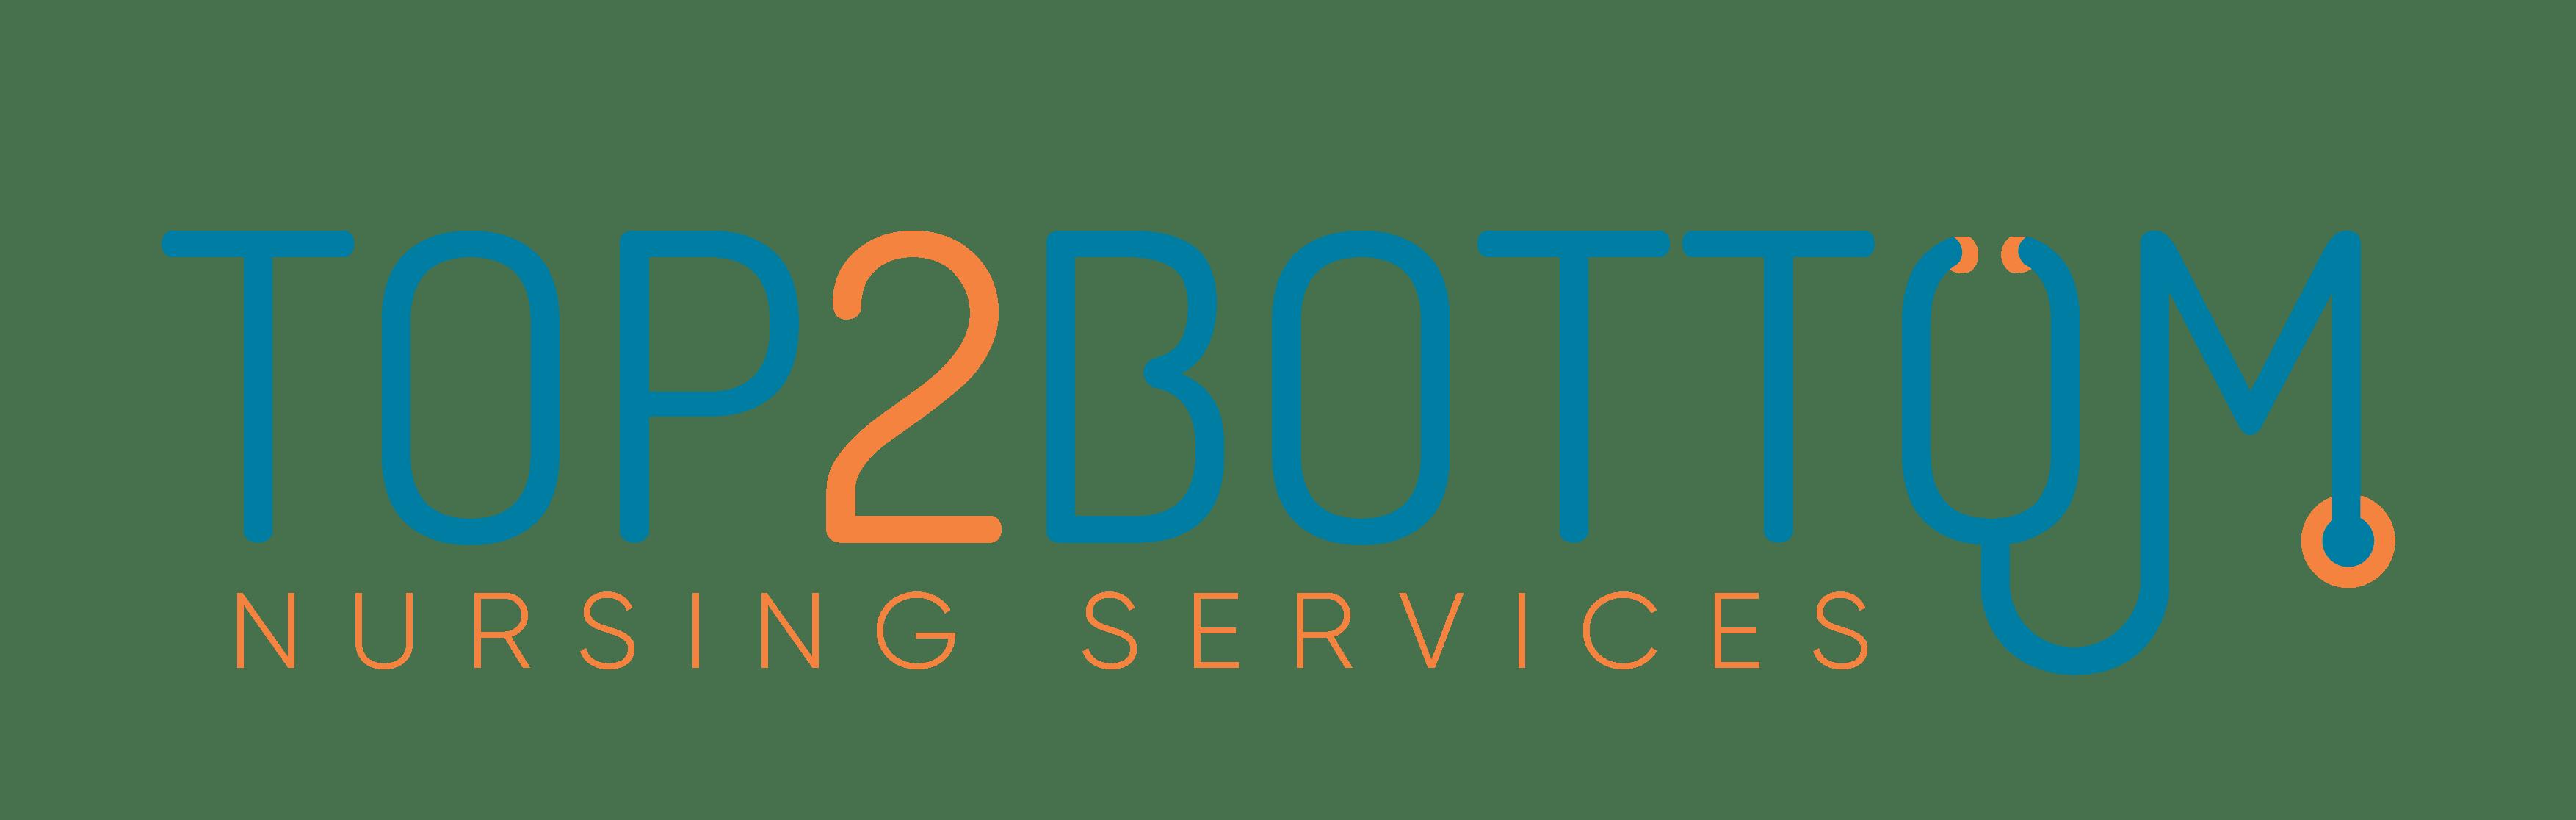 Top 2 Bottom Nursing Service Logo